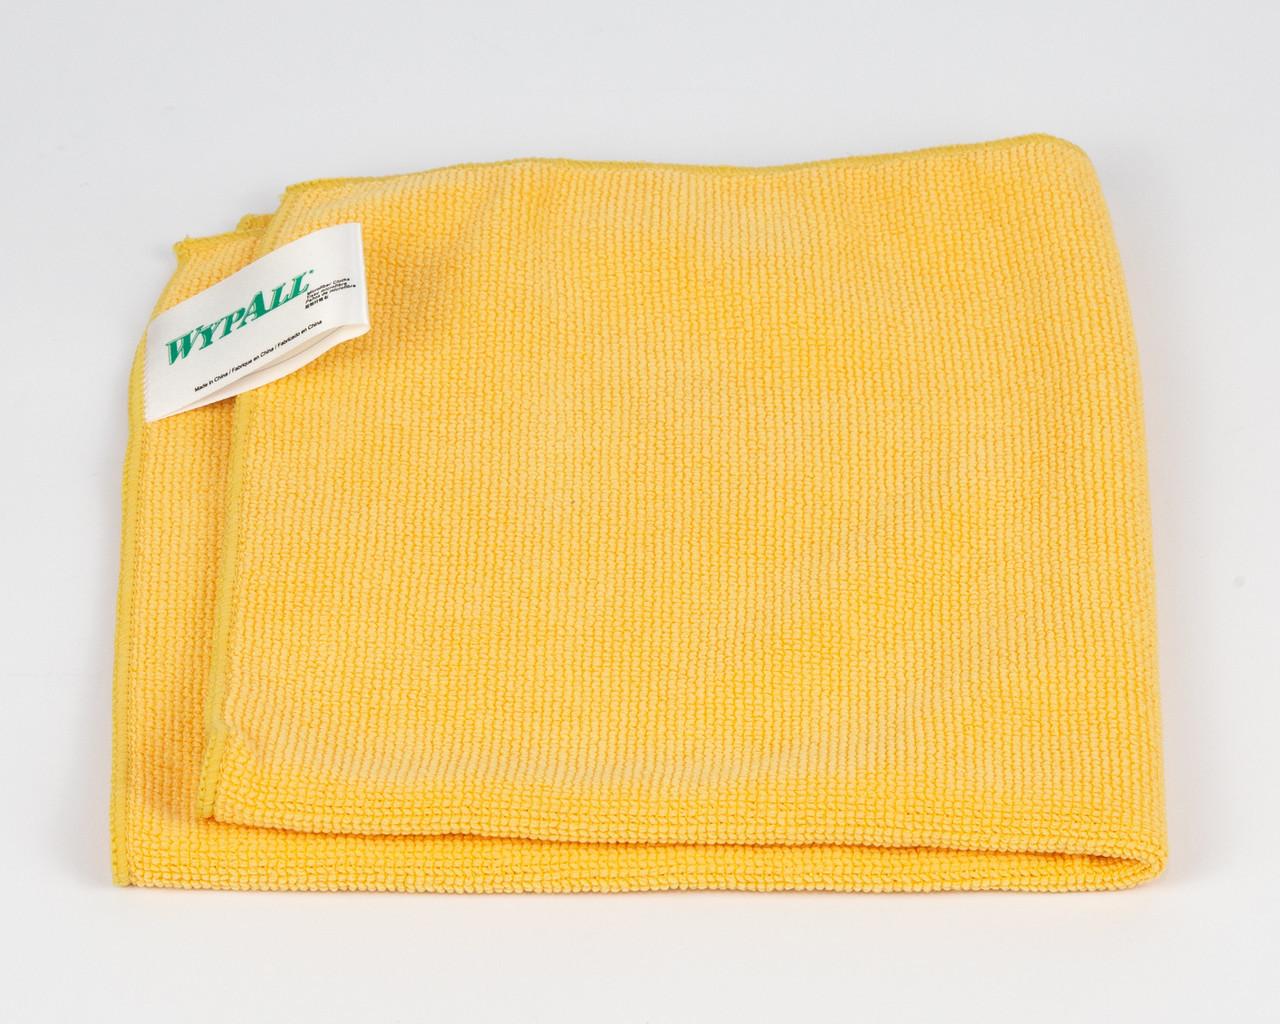 Салфетка микрофибра универсальная Wypall, 40х40см, желтая.